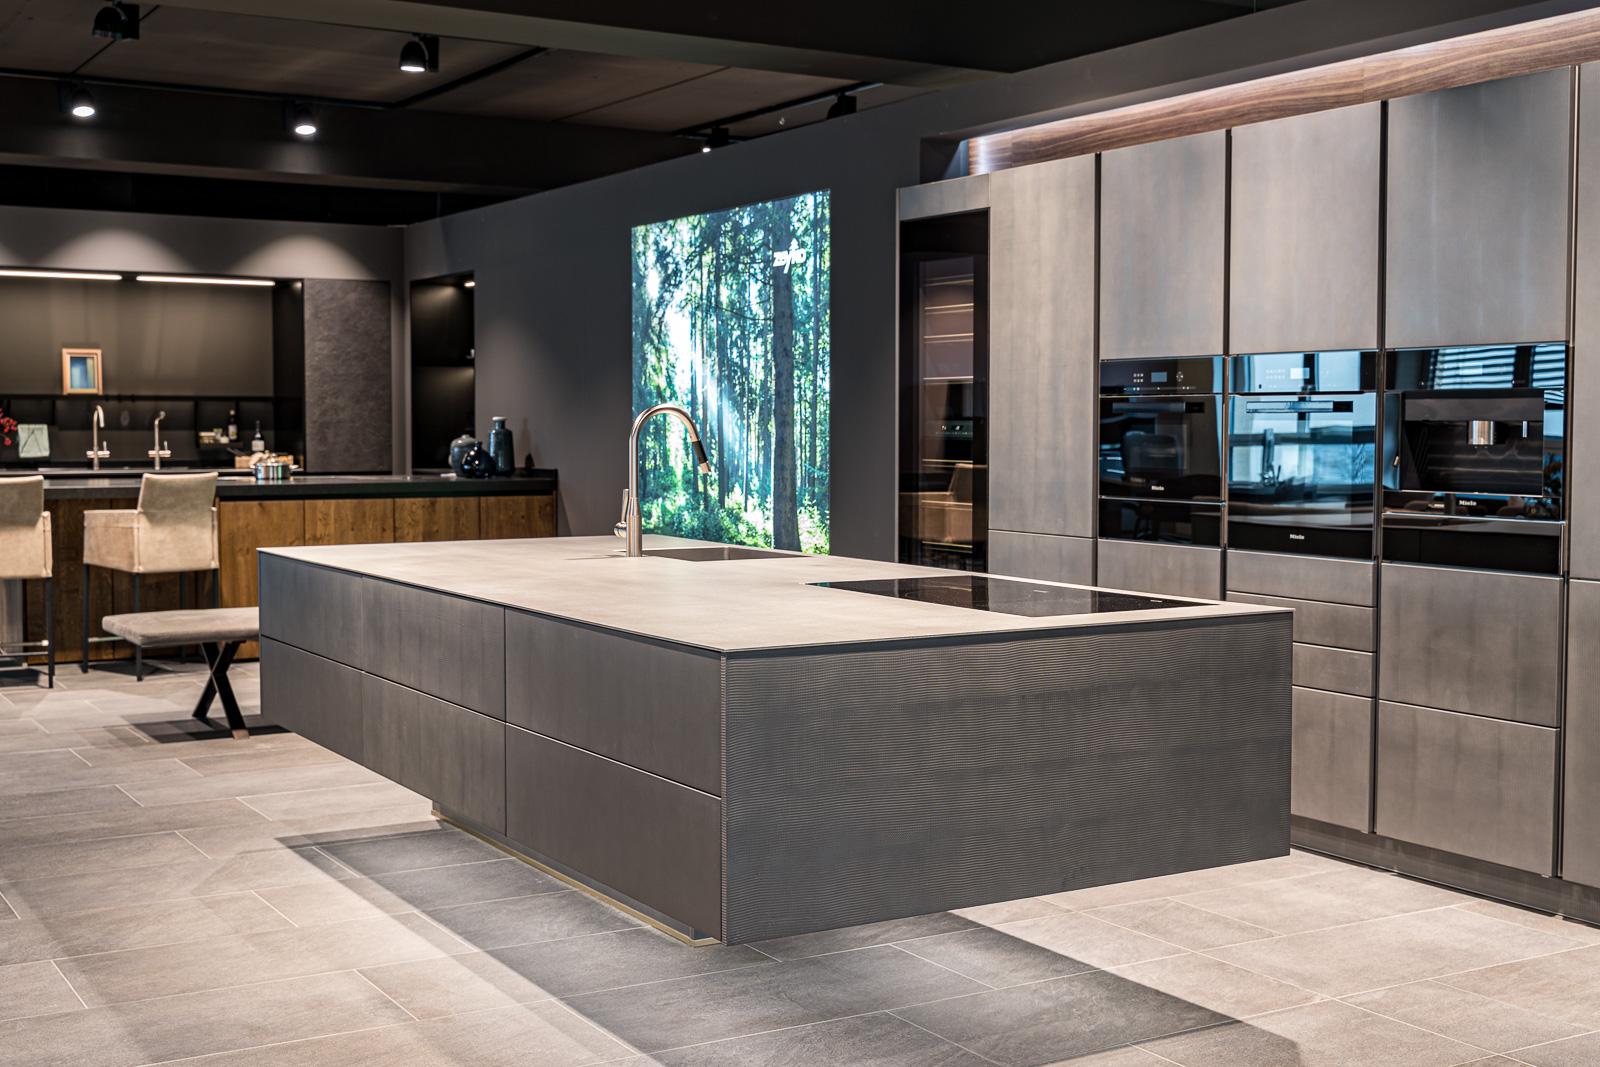 Küchen Galerie Bonn schwebende Küche - Businessshooting Bernadett Yehdou